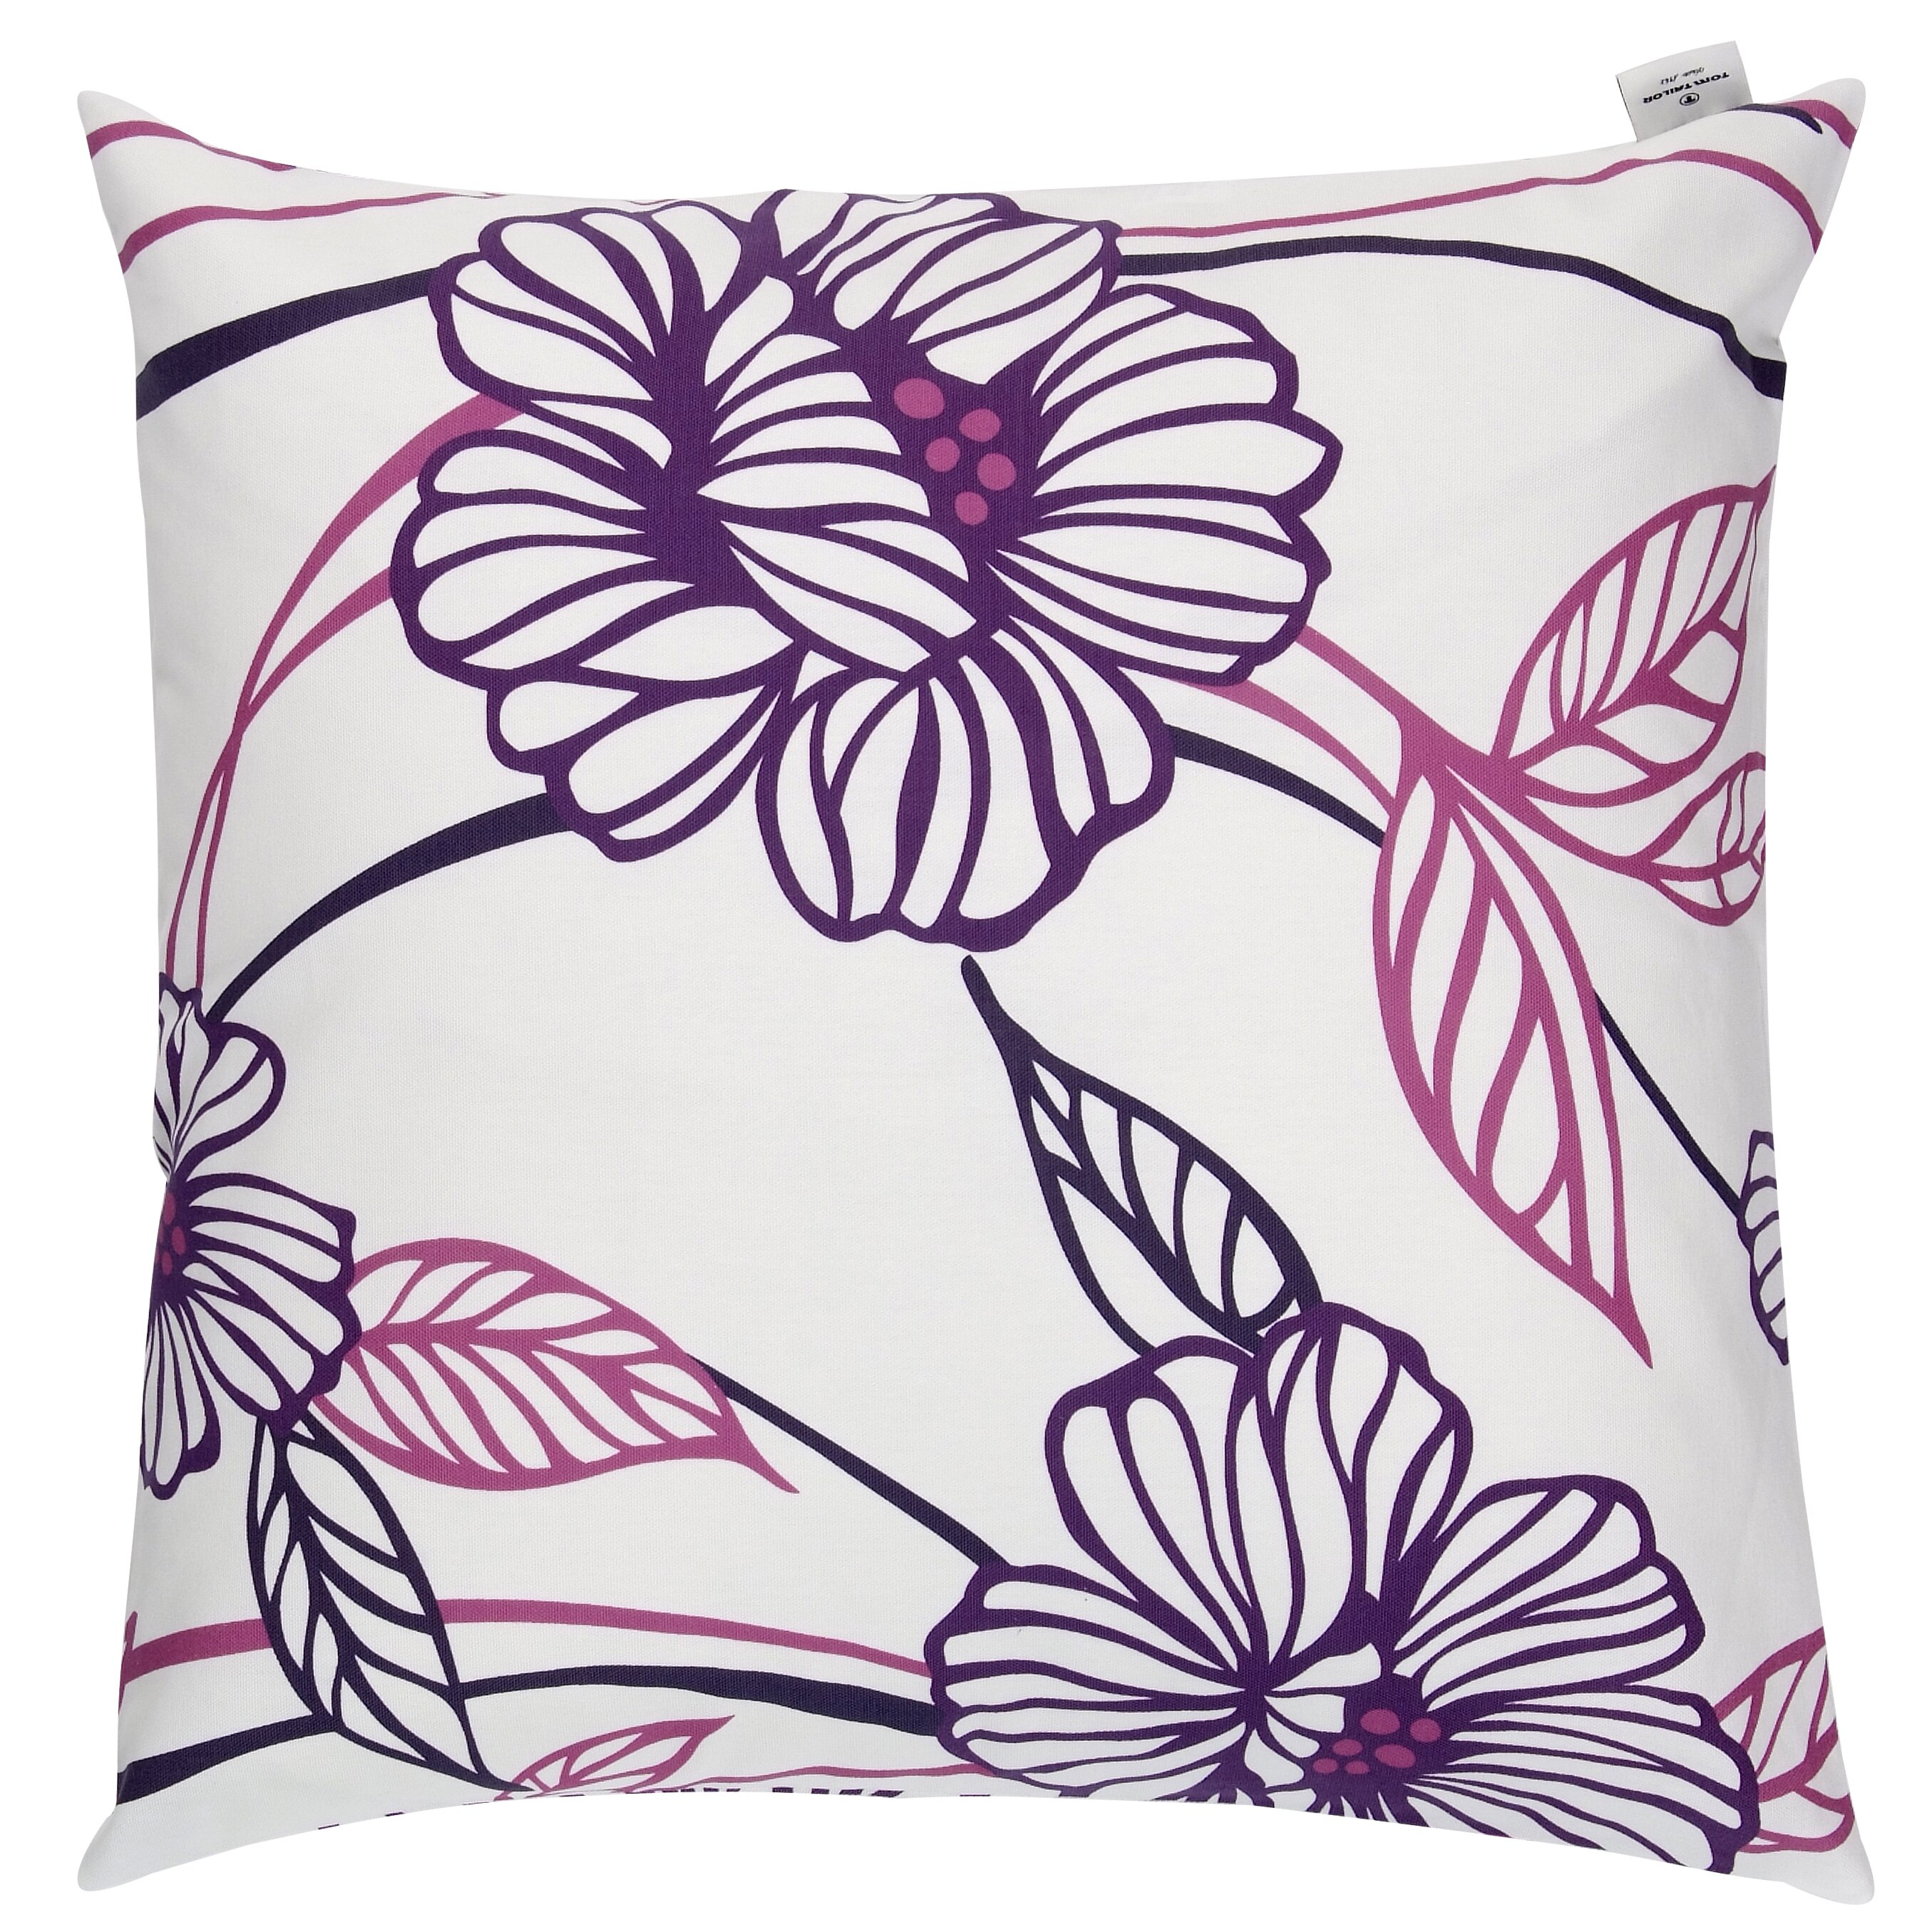 tom tailor kissenbezug big flowers aus 100 baumwolle. Black Bedroom Furniture Sets. Home Design Ideas